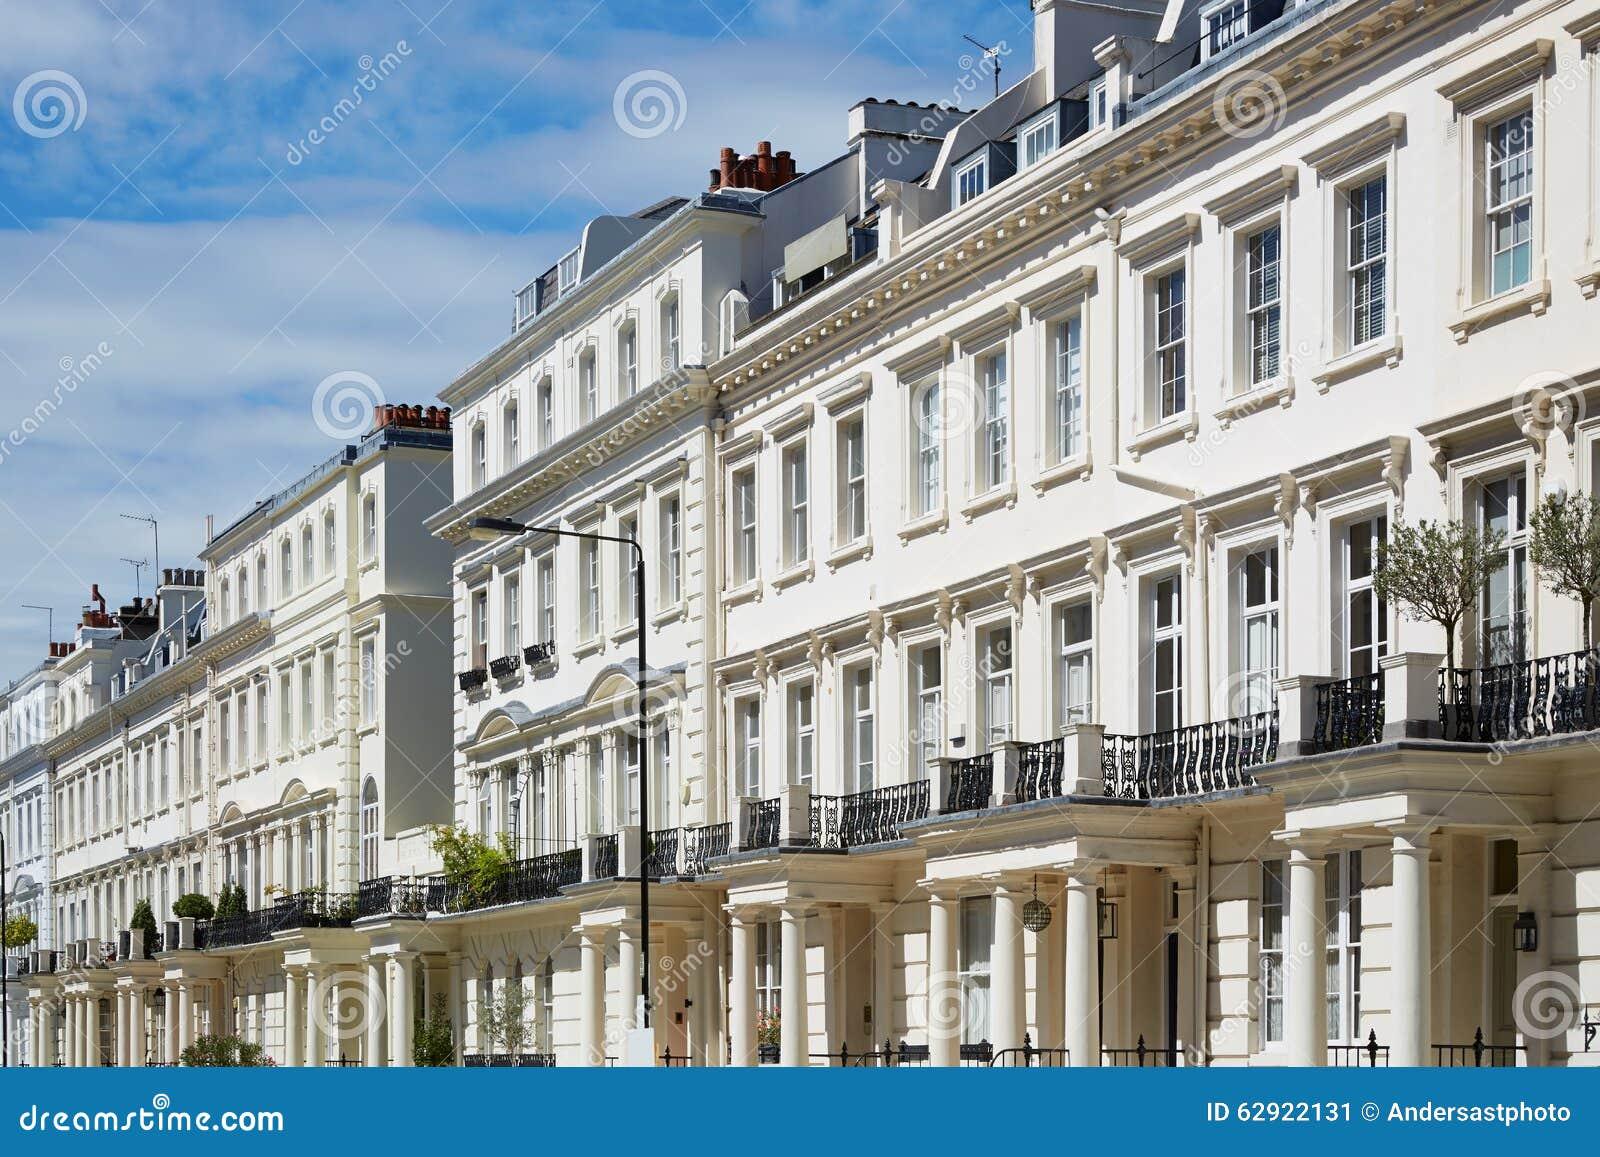 White Houses Facades In London, English Architecture Stock Photo ...